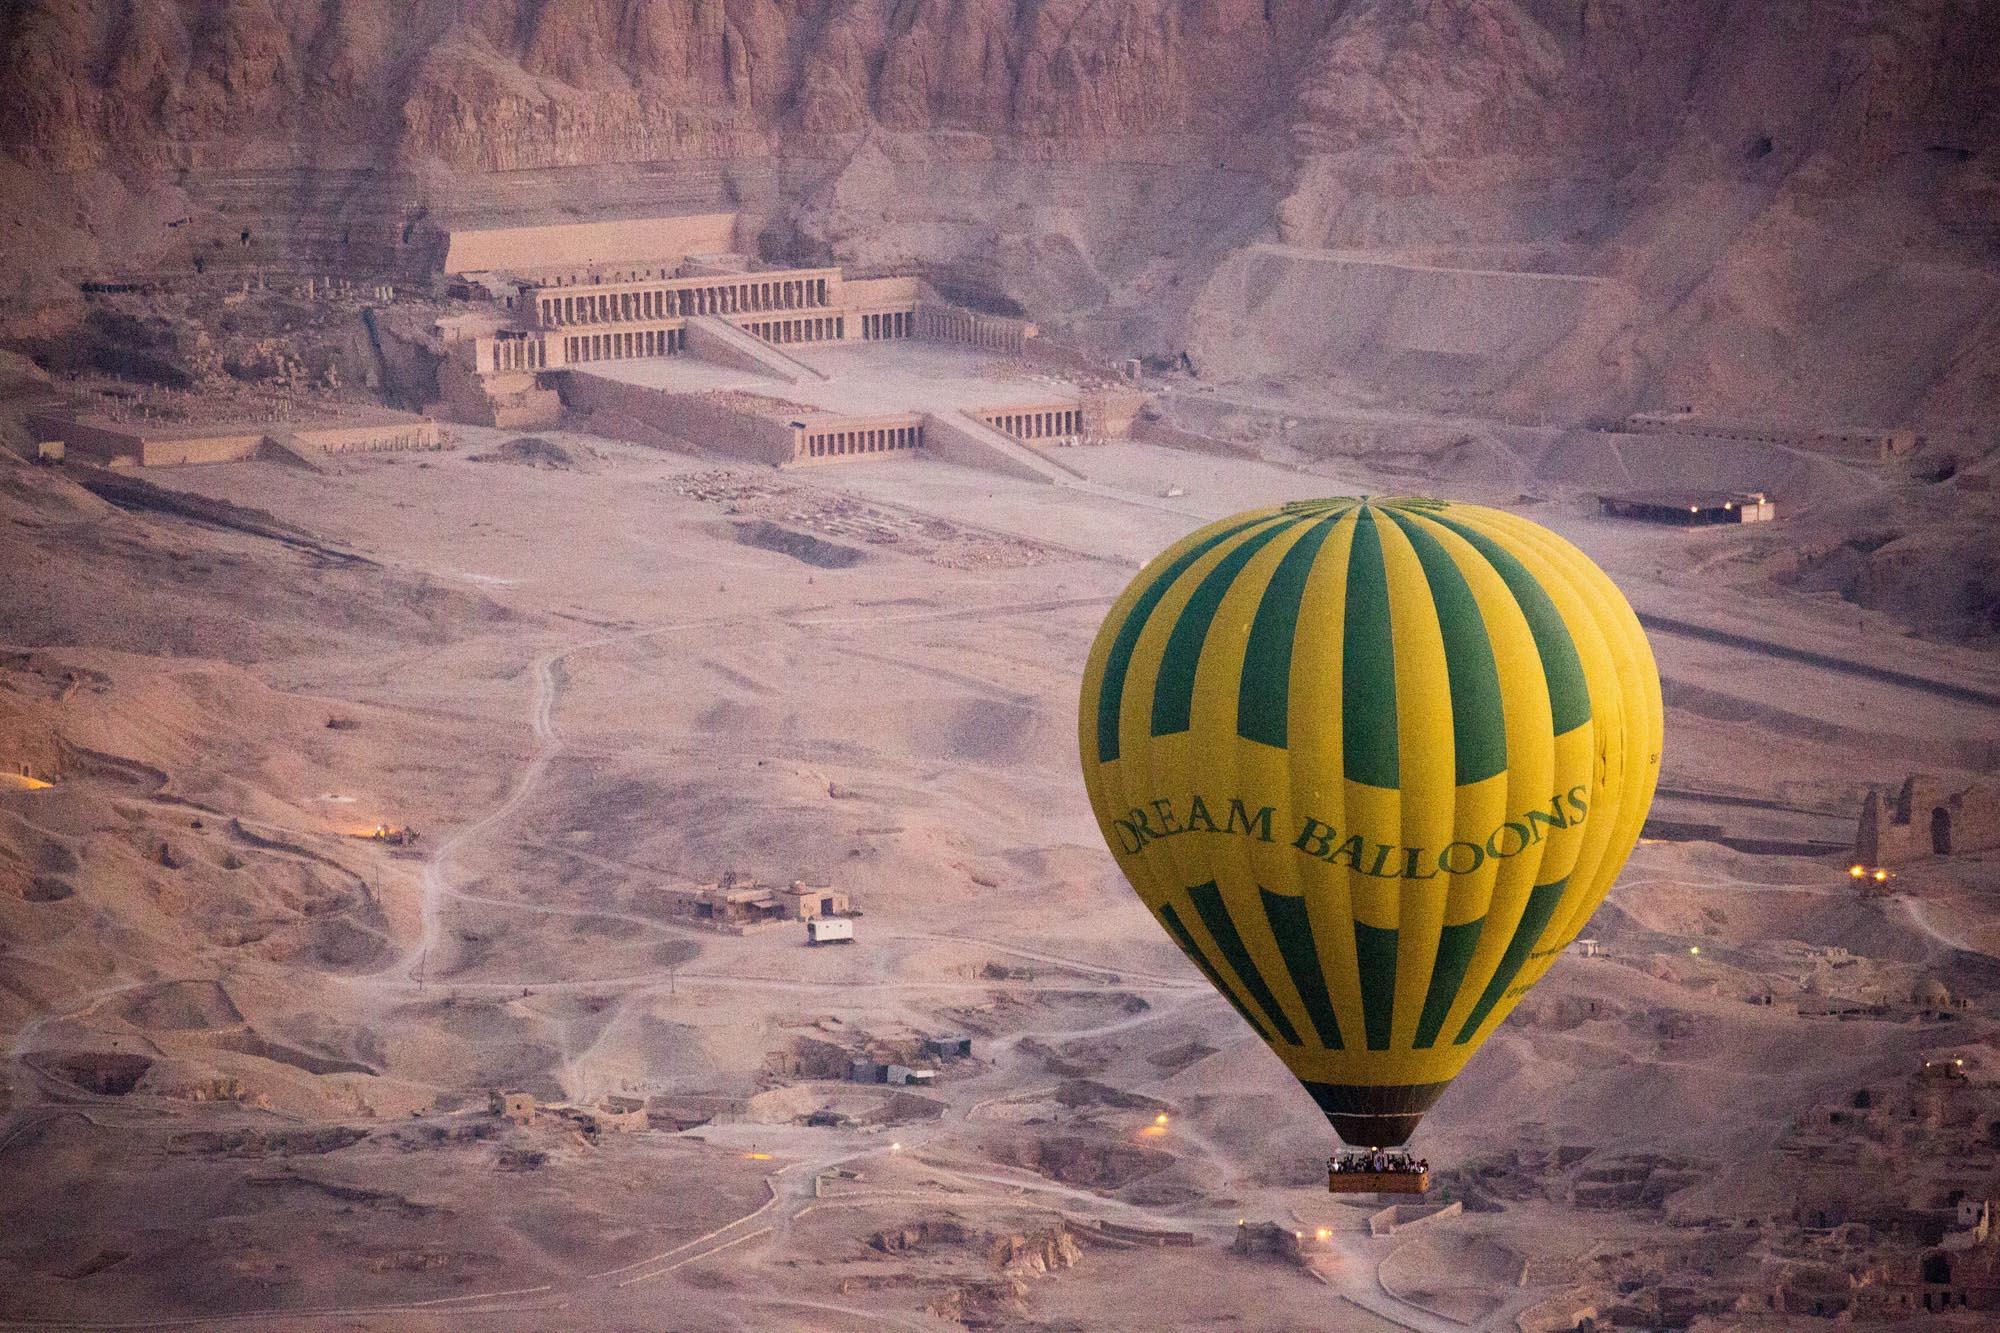 Hot Air Ballooning Luxor Egypt